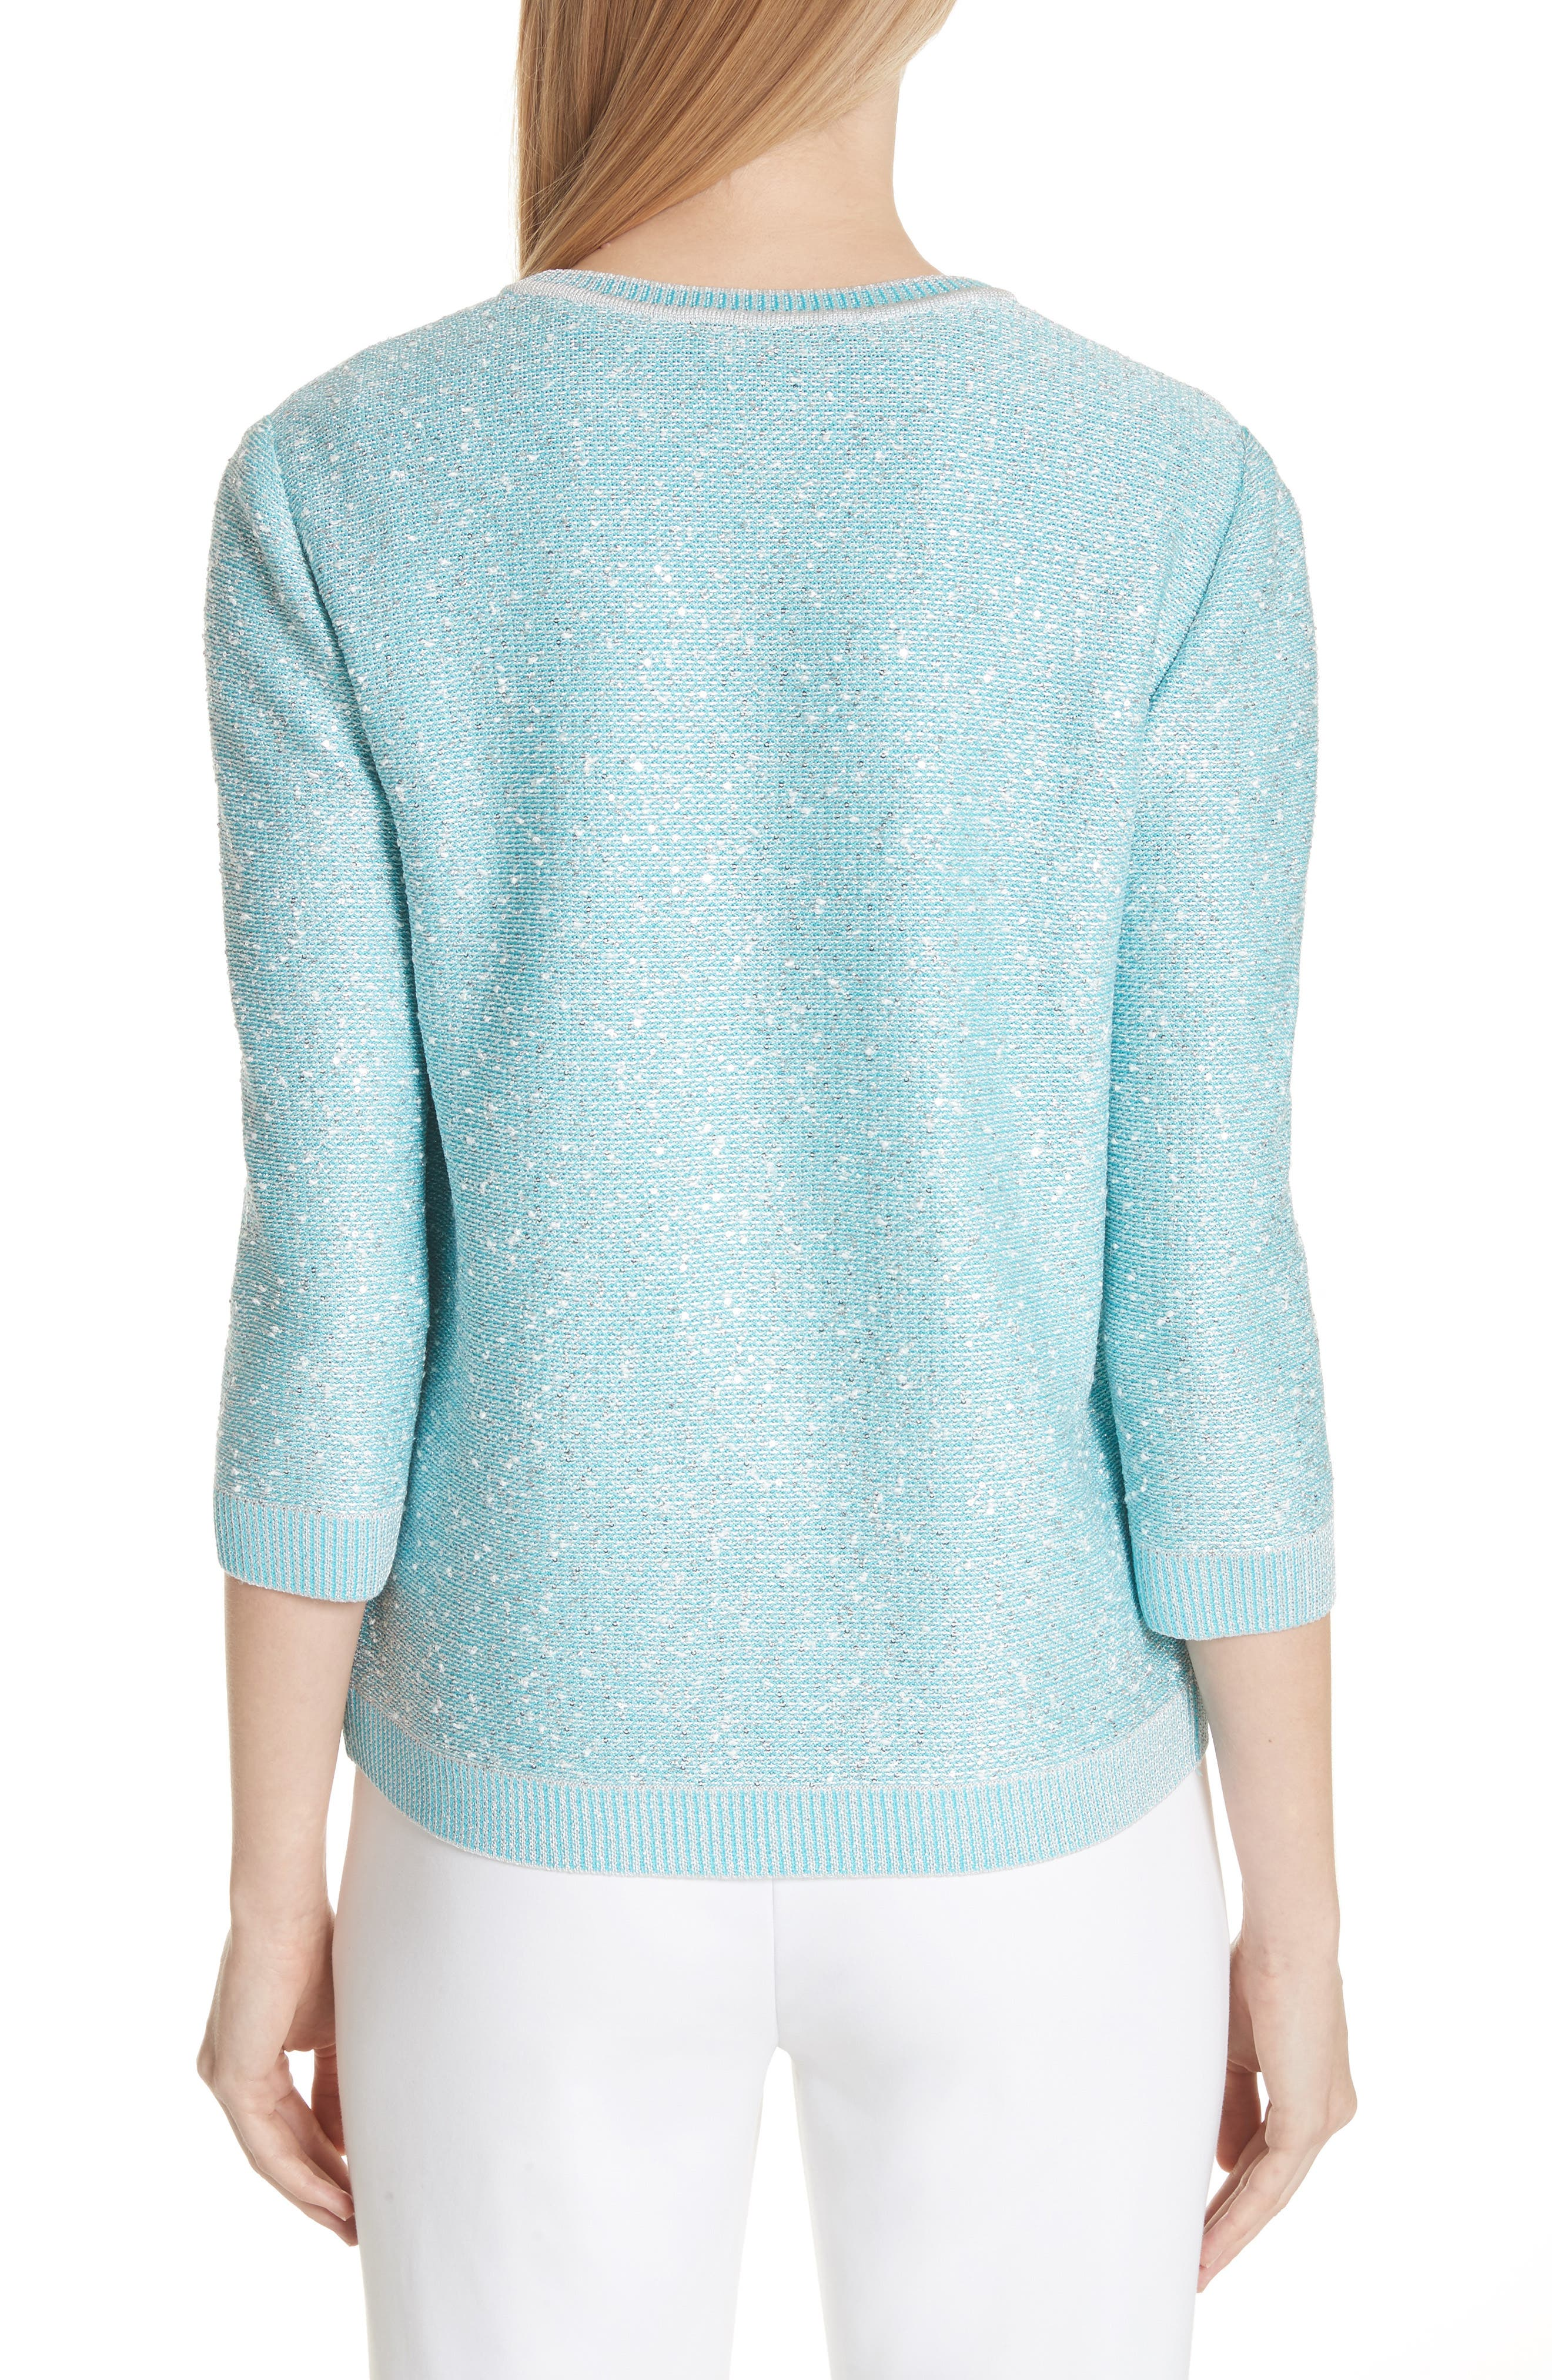 Flecked Sparkle Knit Cardigan,                             Alternate thumbnail 2, color,                             Aqua Multi